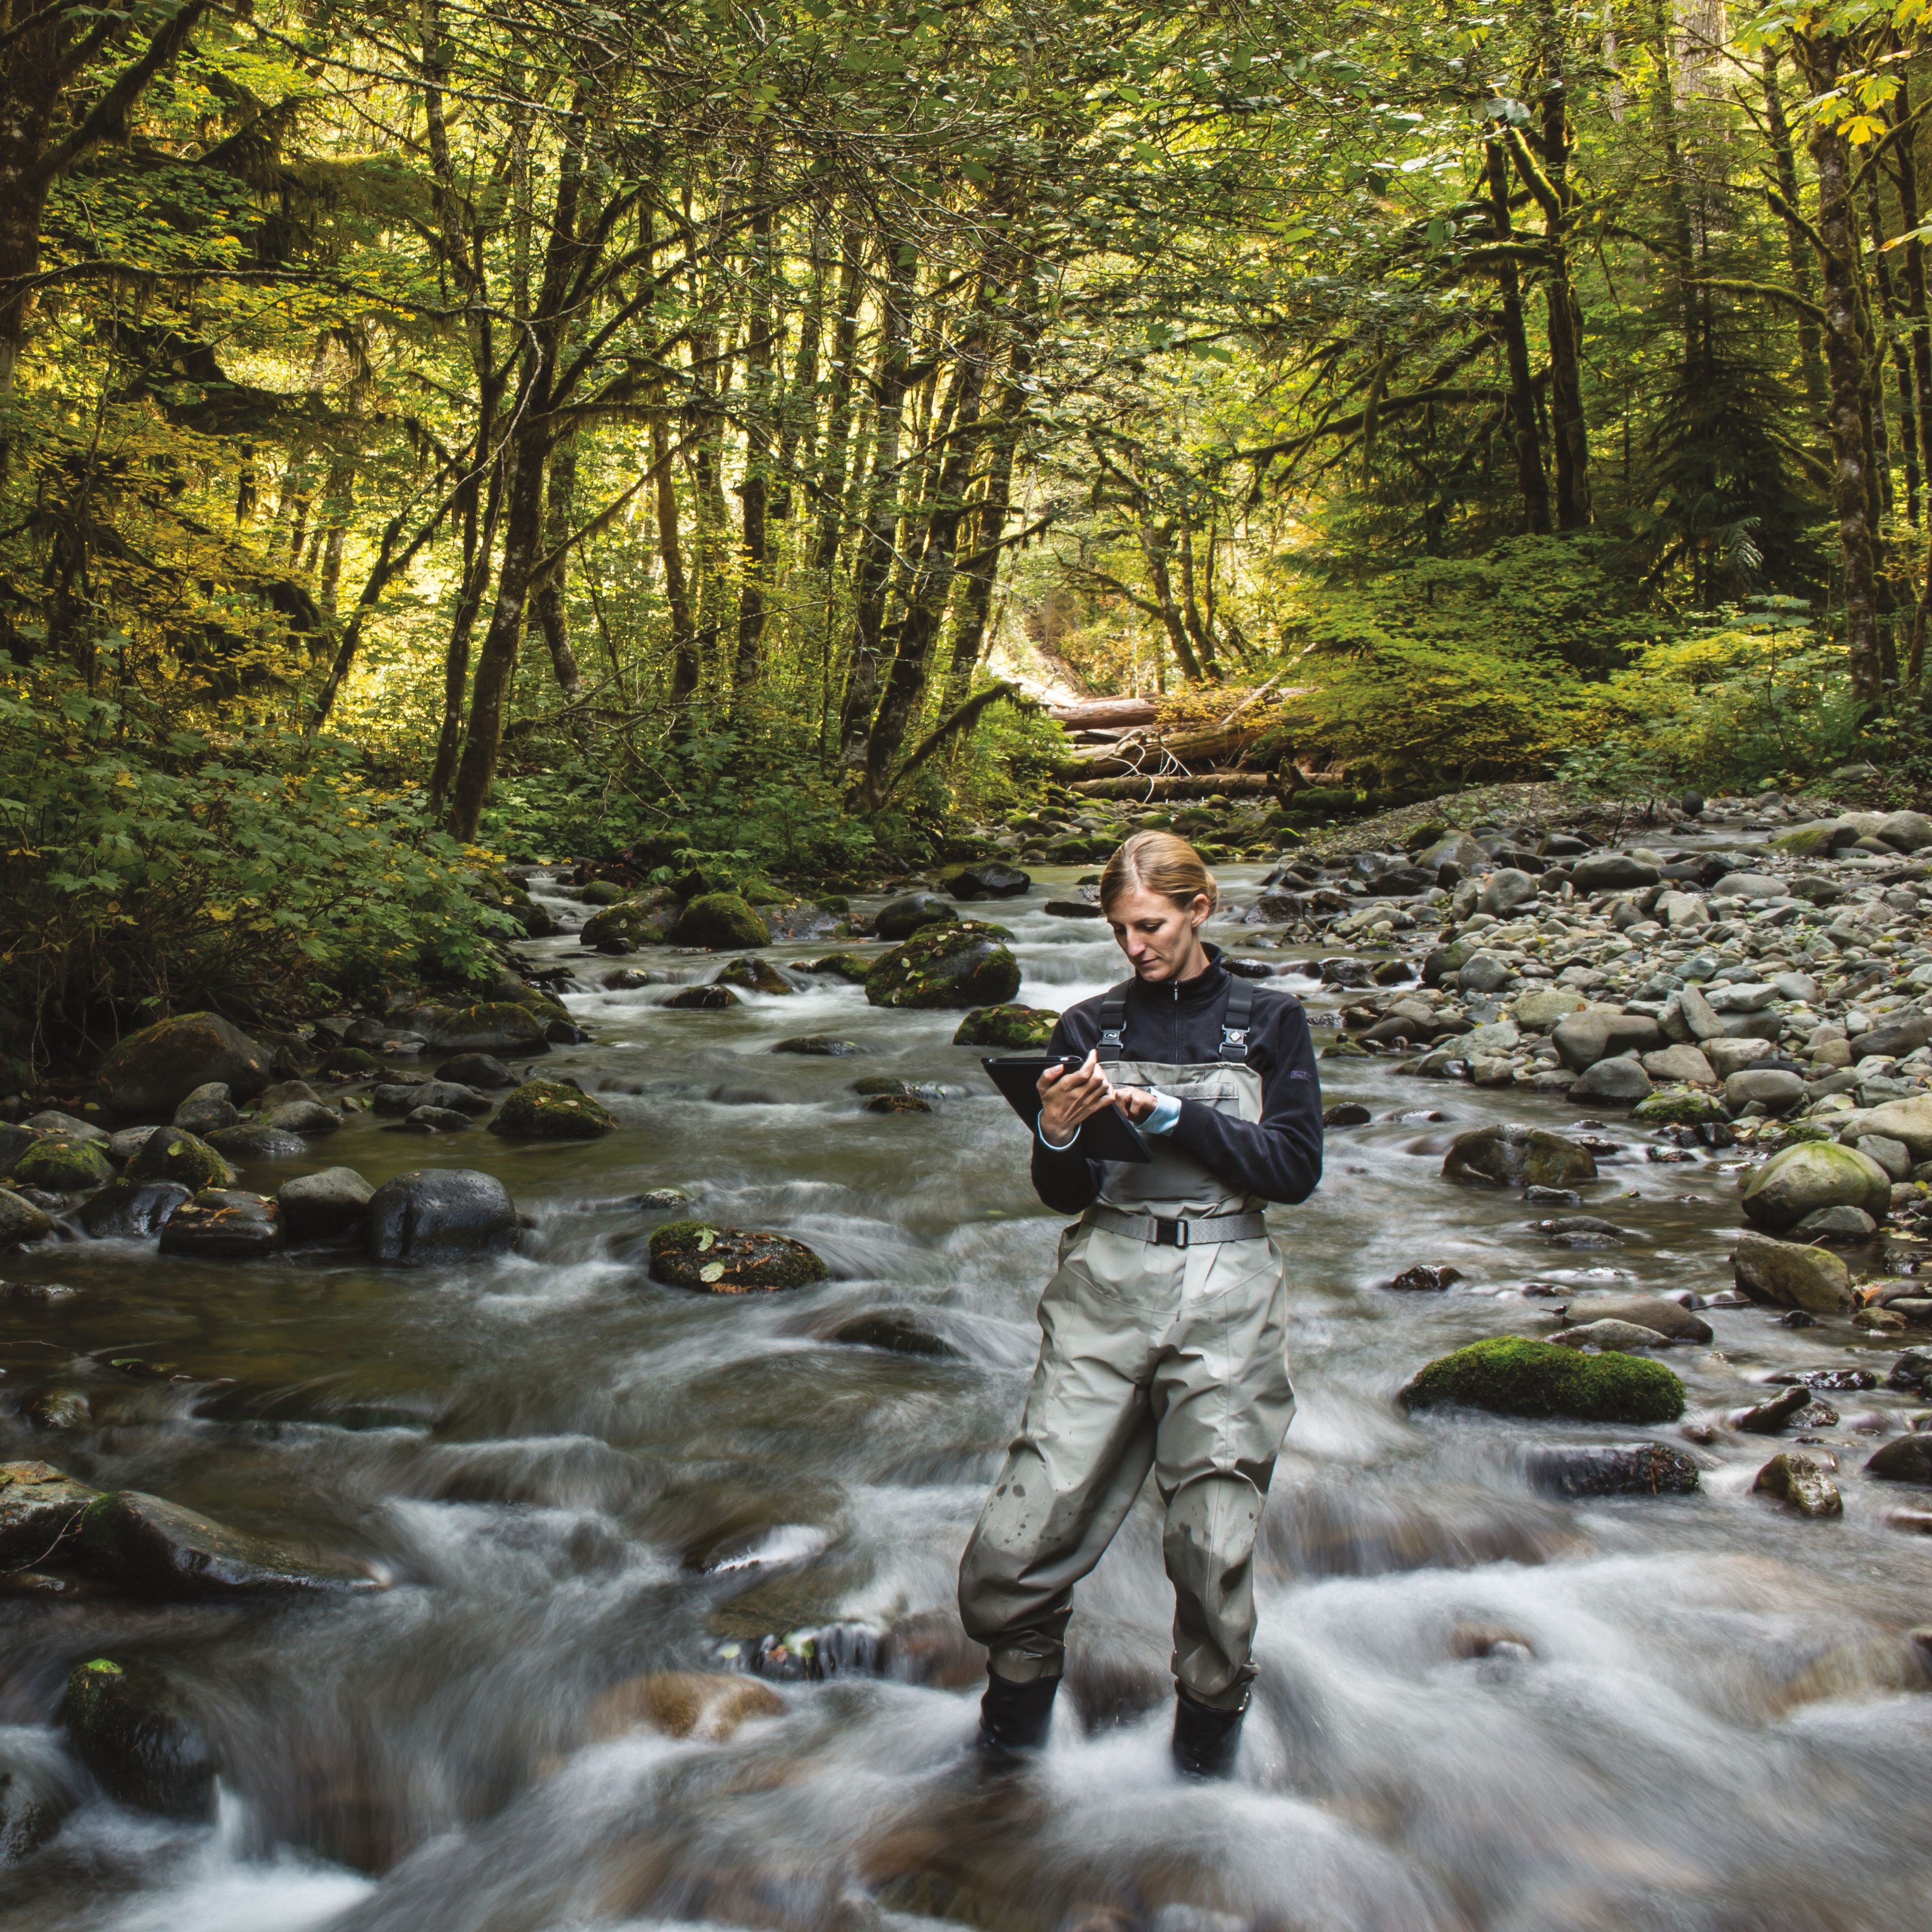 Pomo 1116 laf freshwater trust sa3zx7